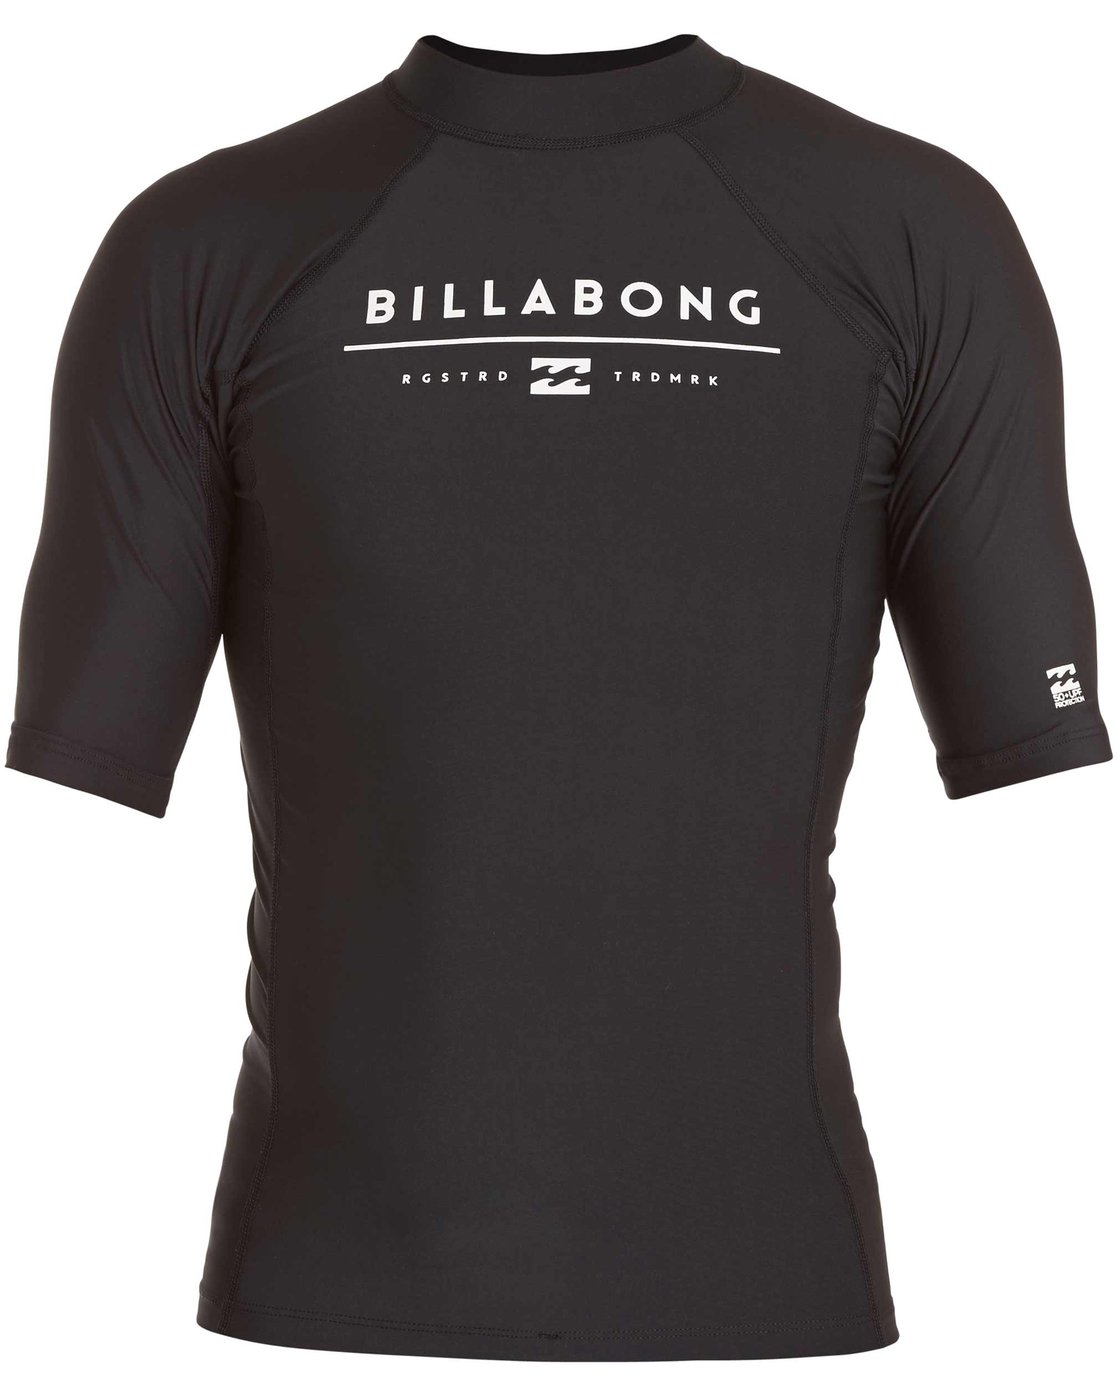 Billabong Boys All Day Unity Performance Fit Short Sleeve Rashguard